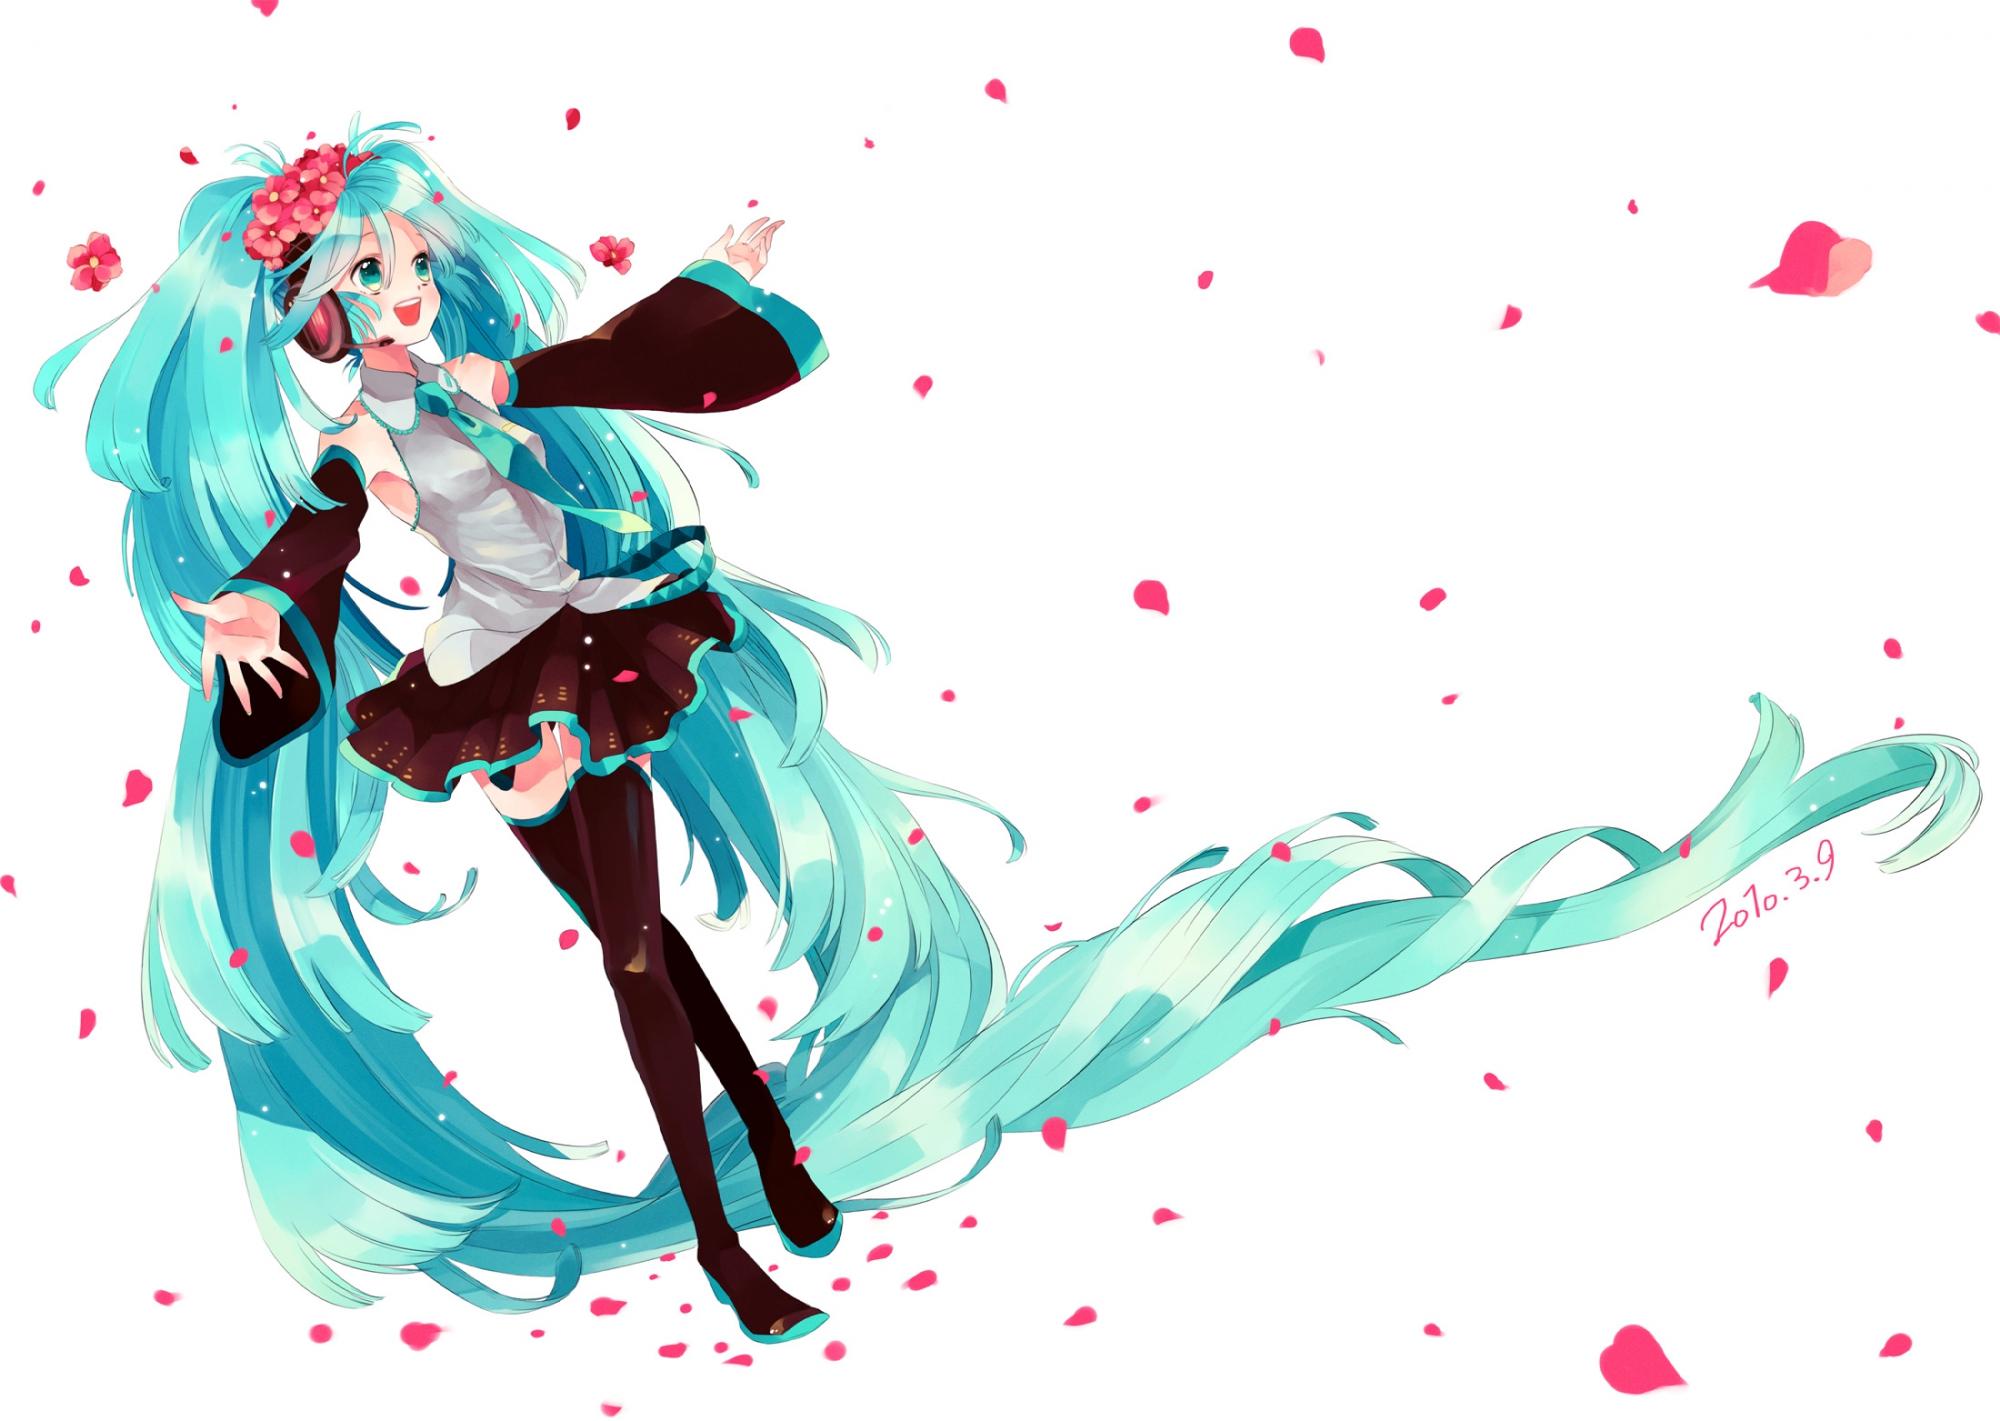 blue_eyes blue_hair flowers hatsune_miku headphones long_hair petals skirt thighhighs tie twintails vocaloid white